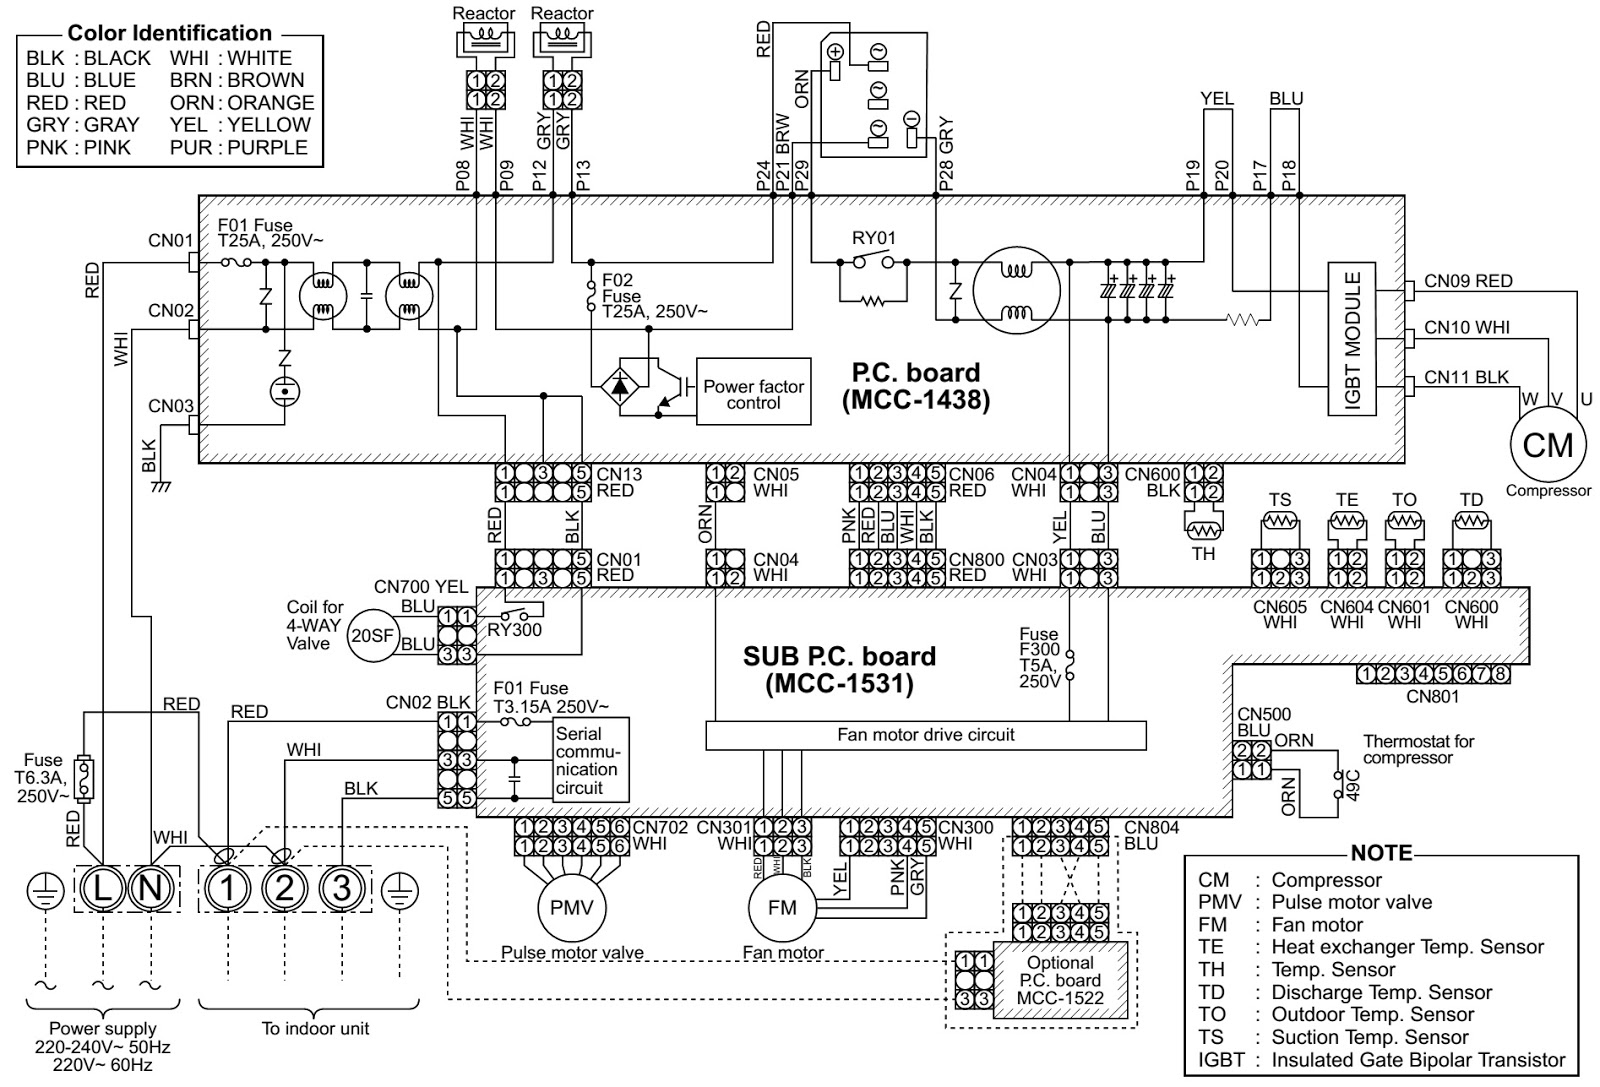 small resolution of toshiba airconditioners split type wiring diagram digital toshiba air conditioning wiring diagram toshiba air conditioner installation manual